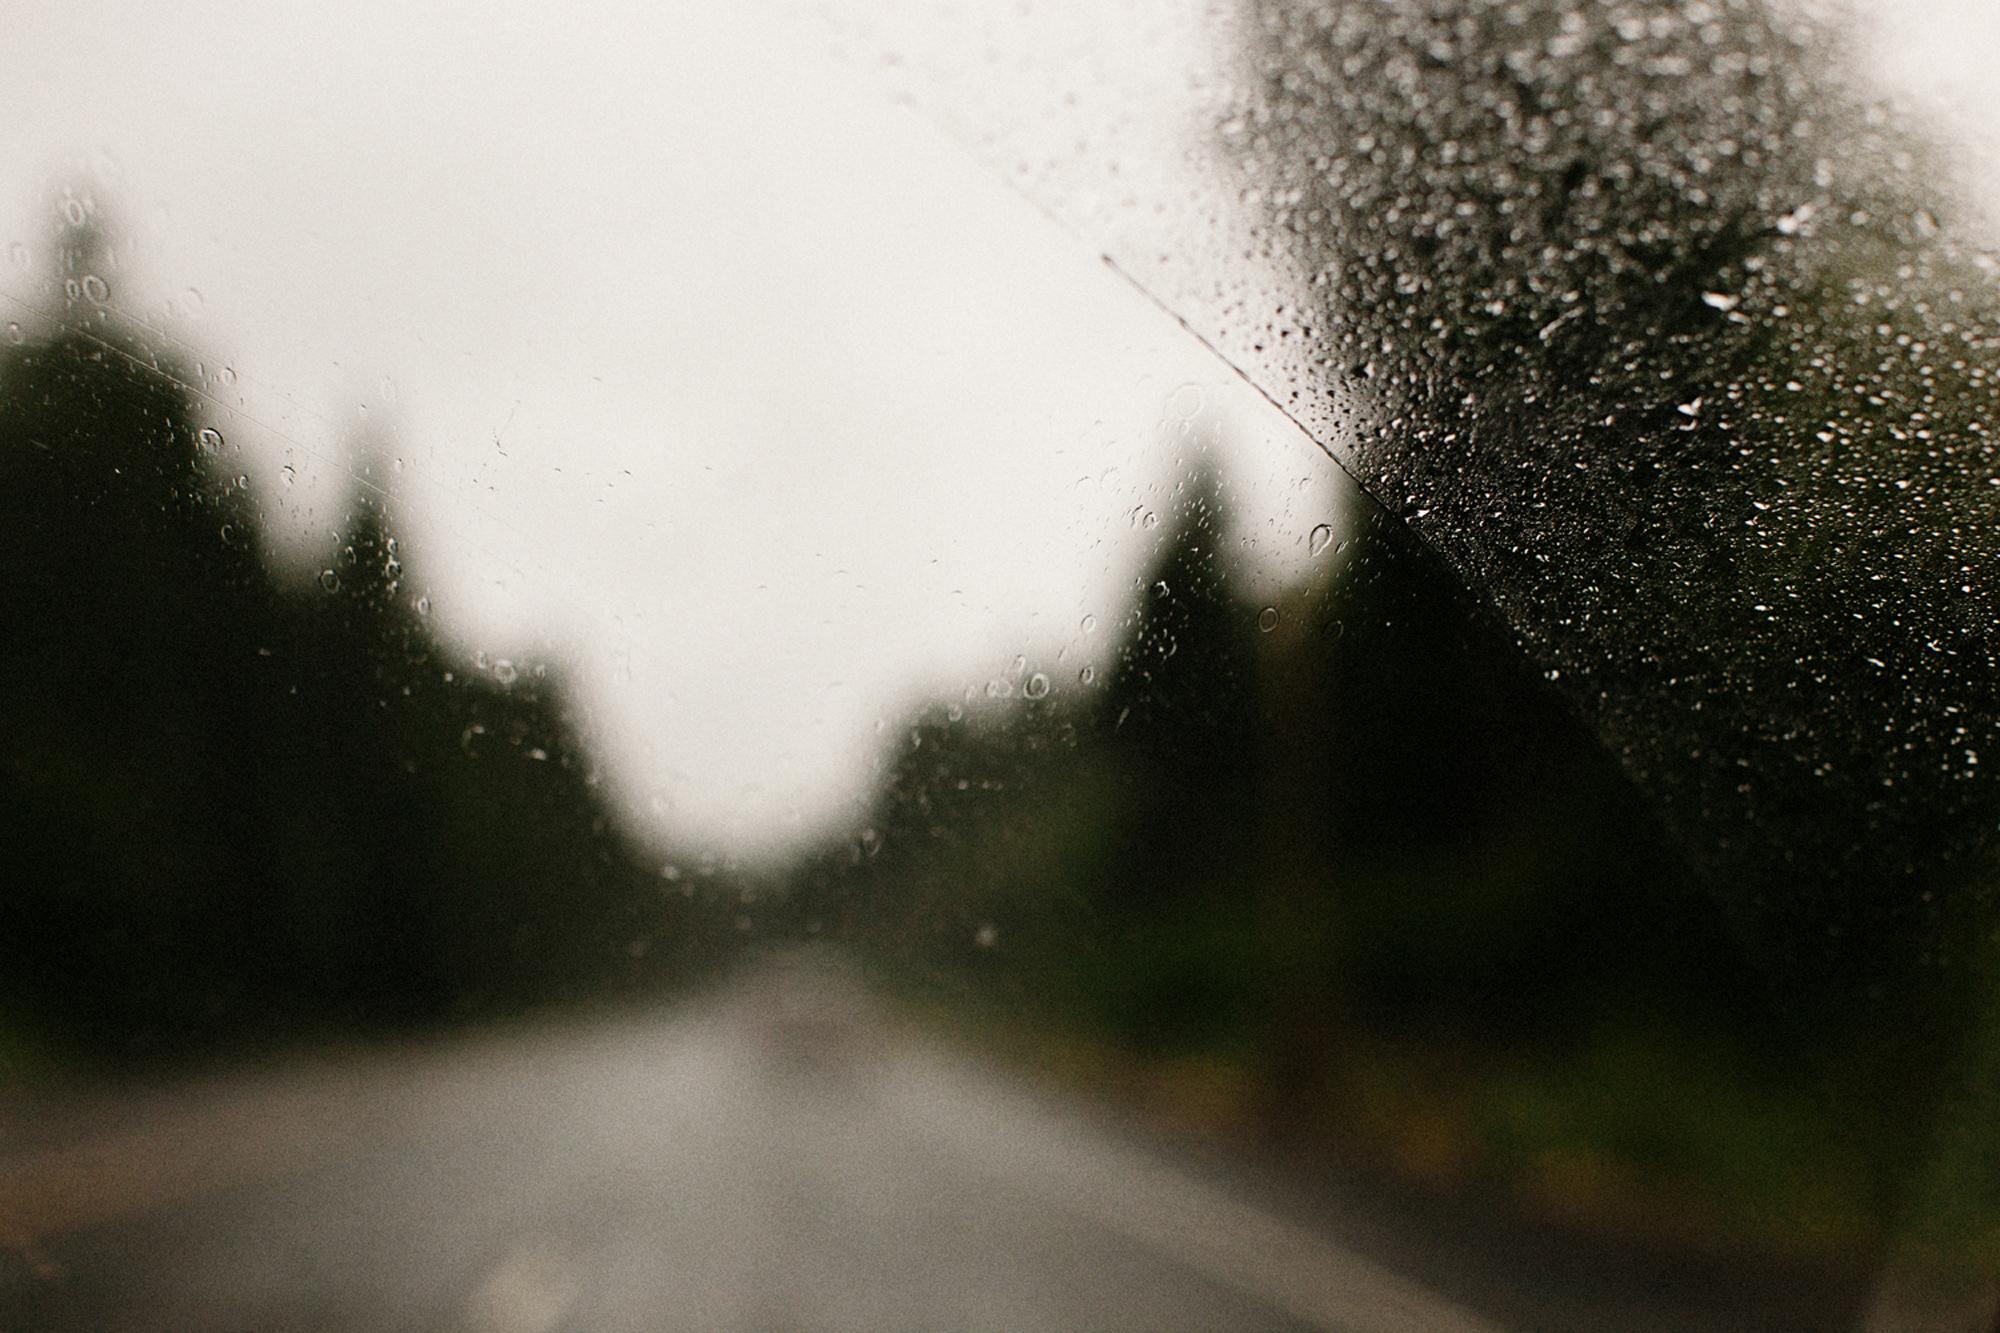 017-rain-on-window.jpg